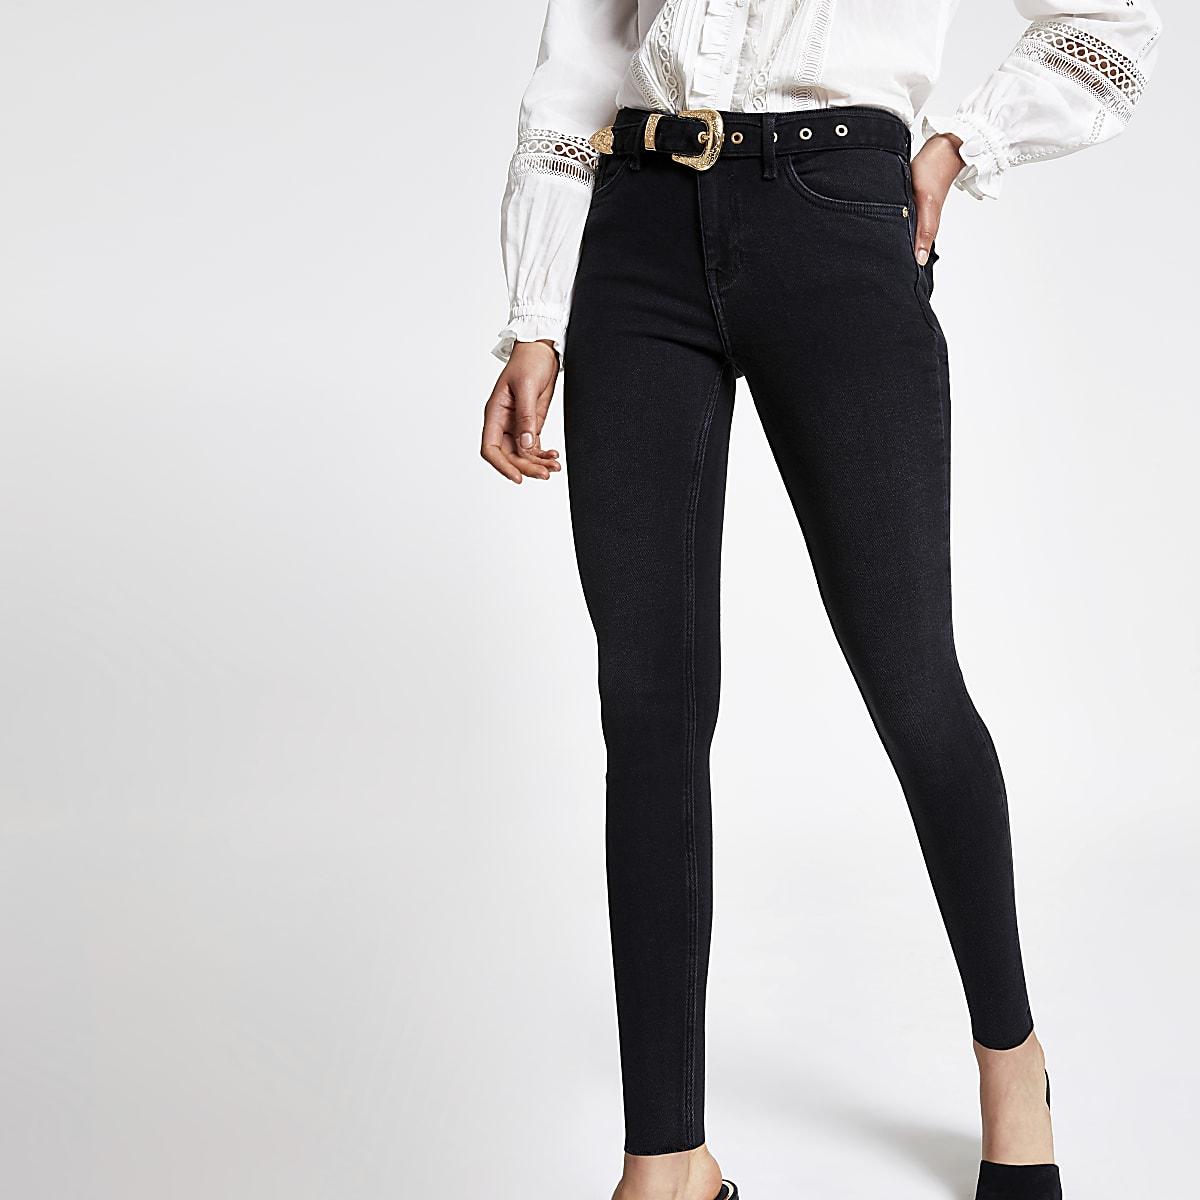 Amelie – Schwarze Super Skinny Jeans mit Gürtel